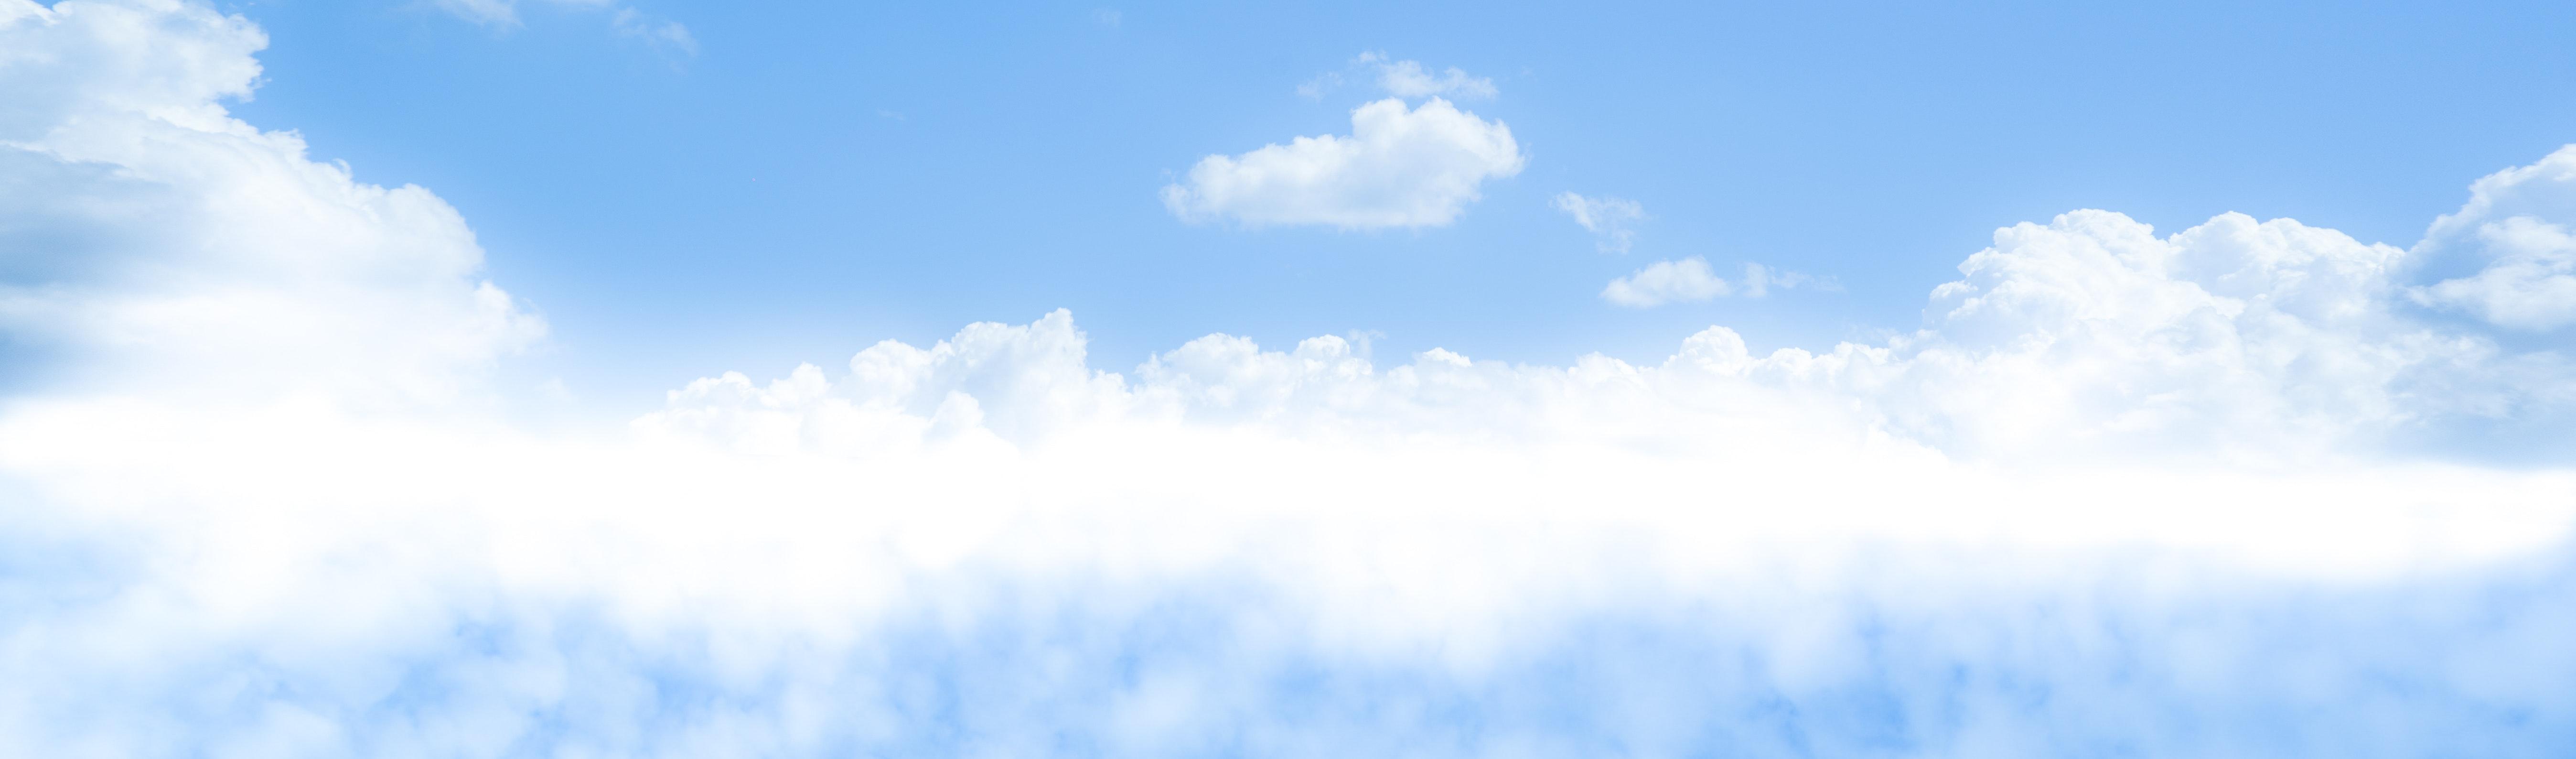 sky images 183 pexels 183 free stock photos